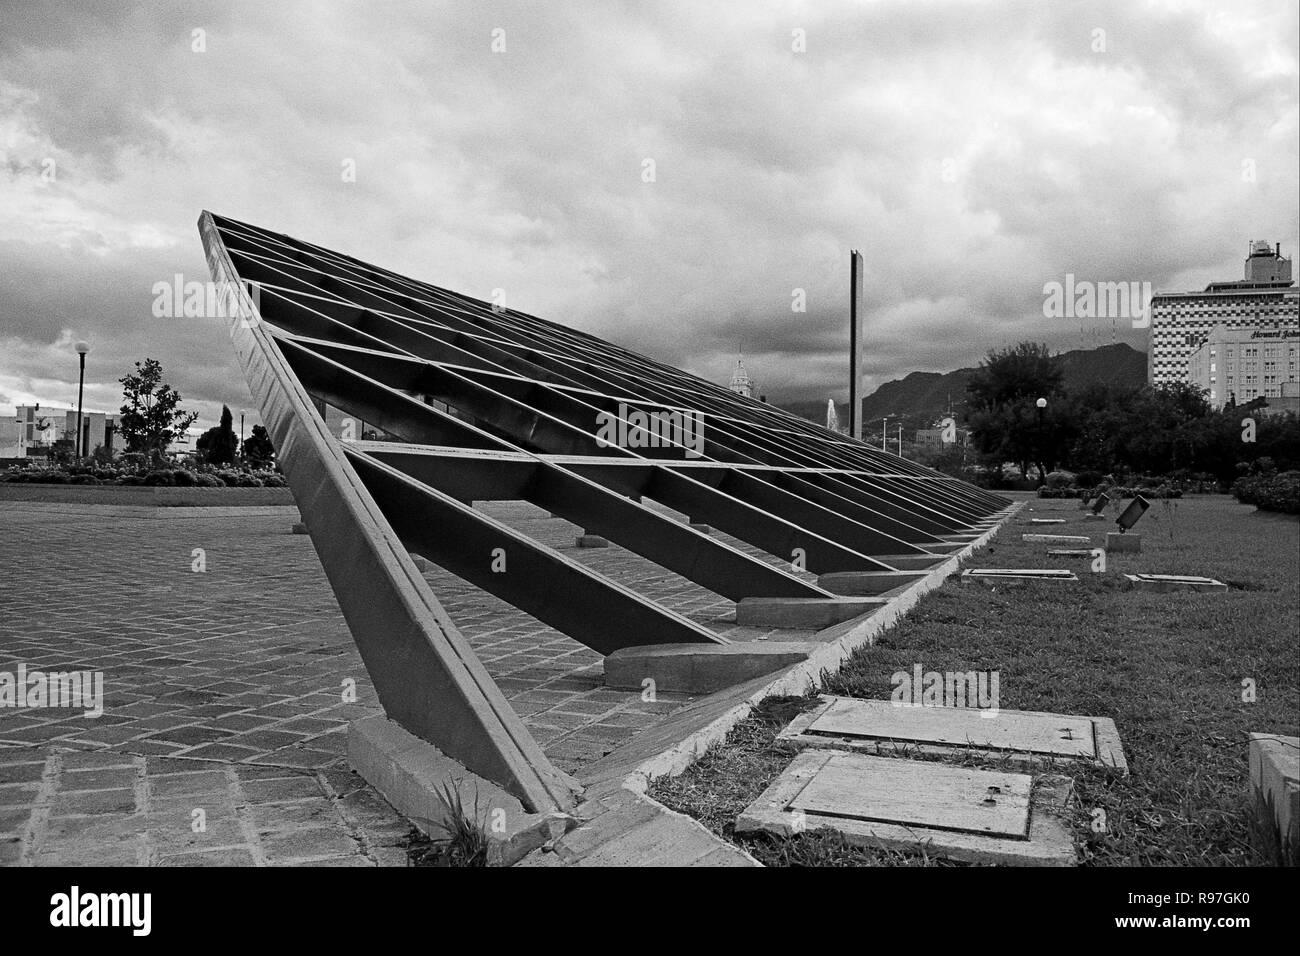 MONTERREY, NL/MEXICO - NOV 10, 2003: Unidentified steel sculpture at the Macroplaza Stock Photo